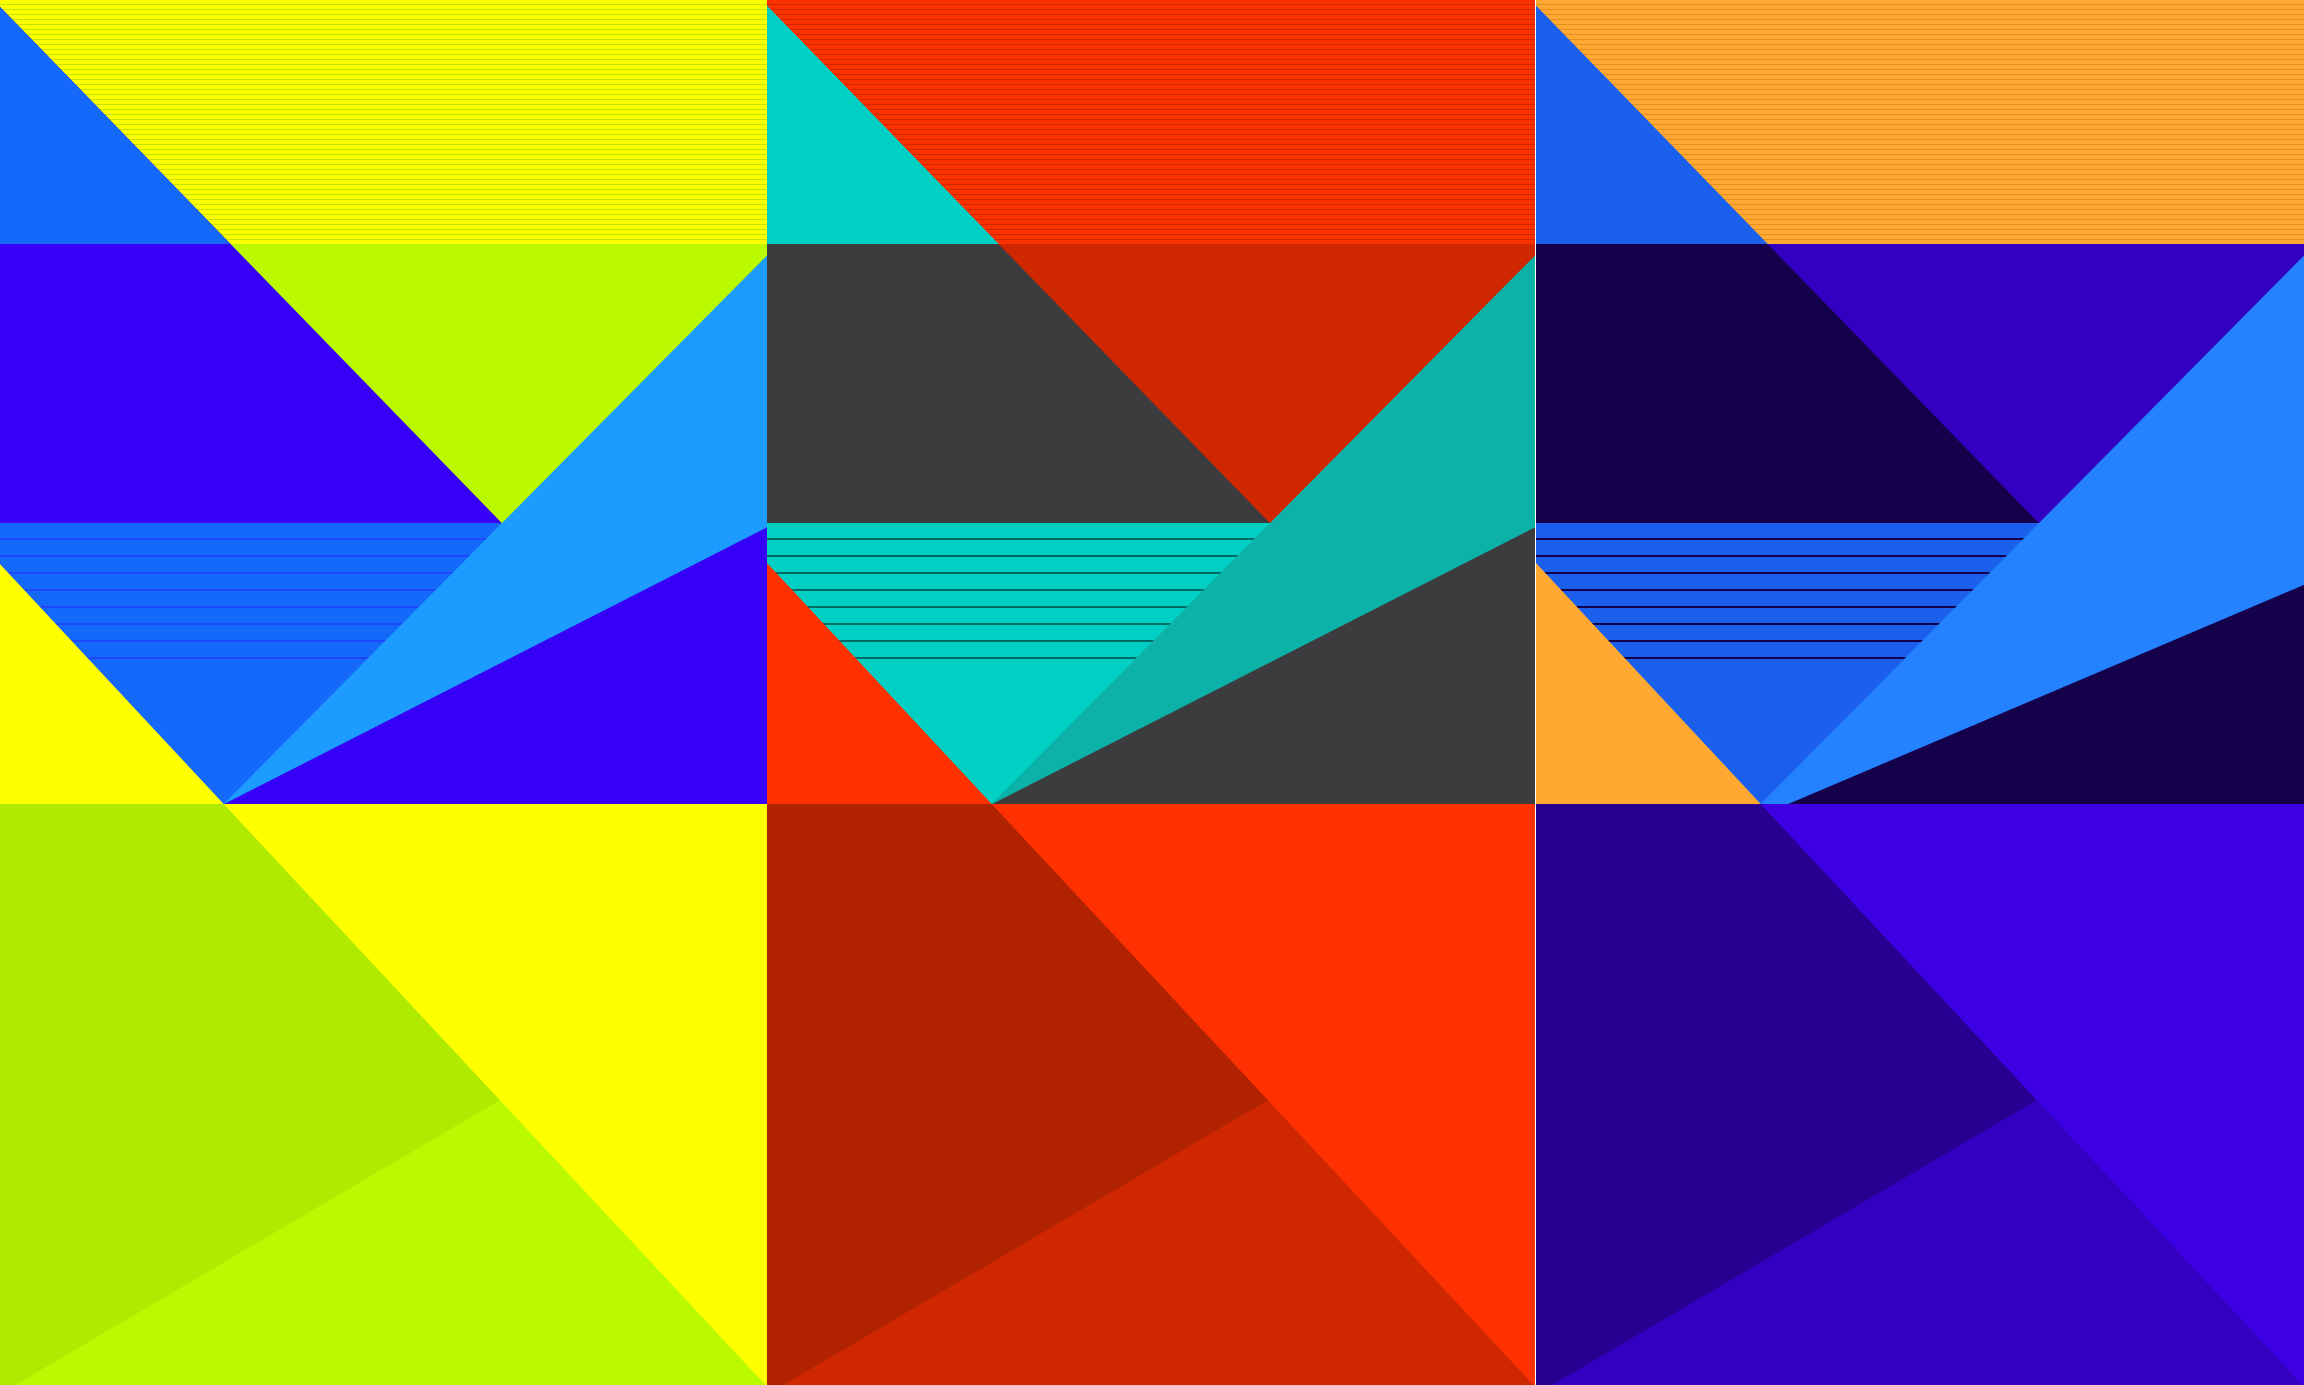 Windows Phone Wallpapers - Top Free Windows Phone